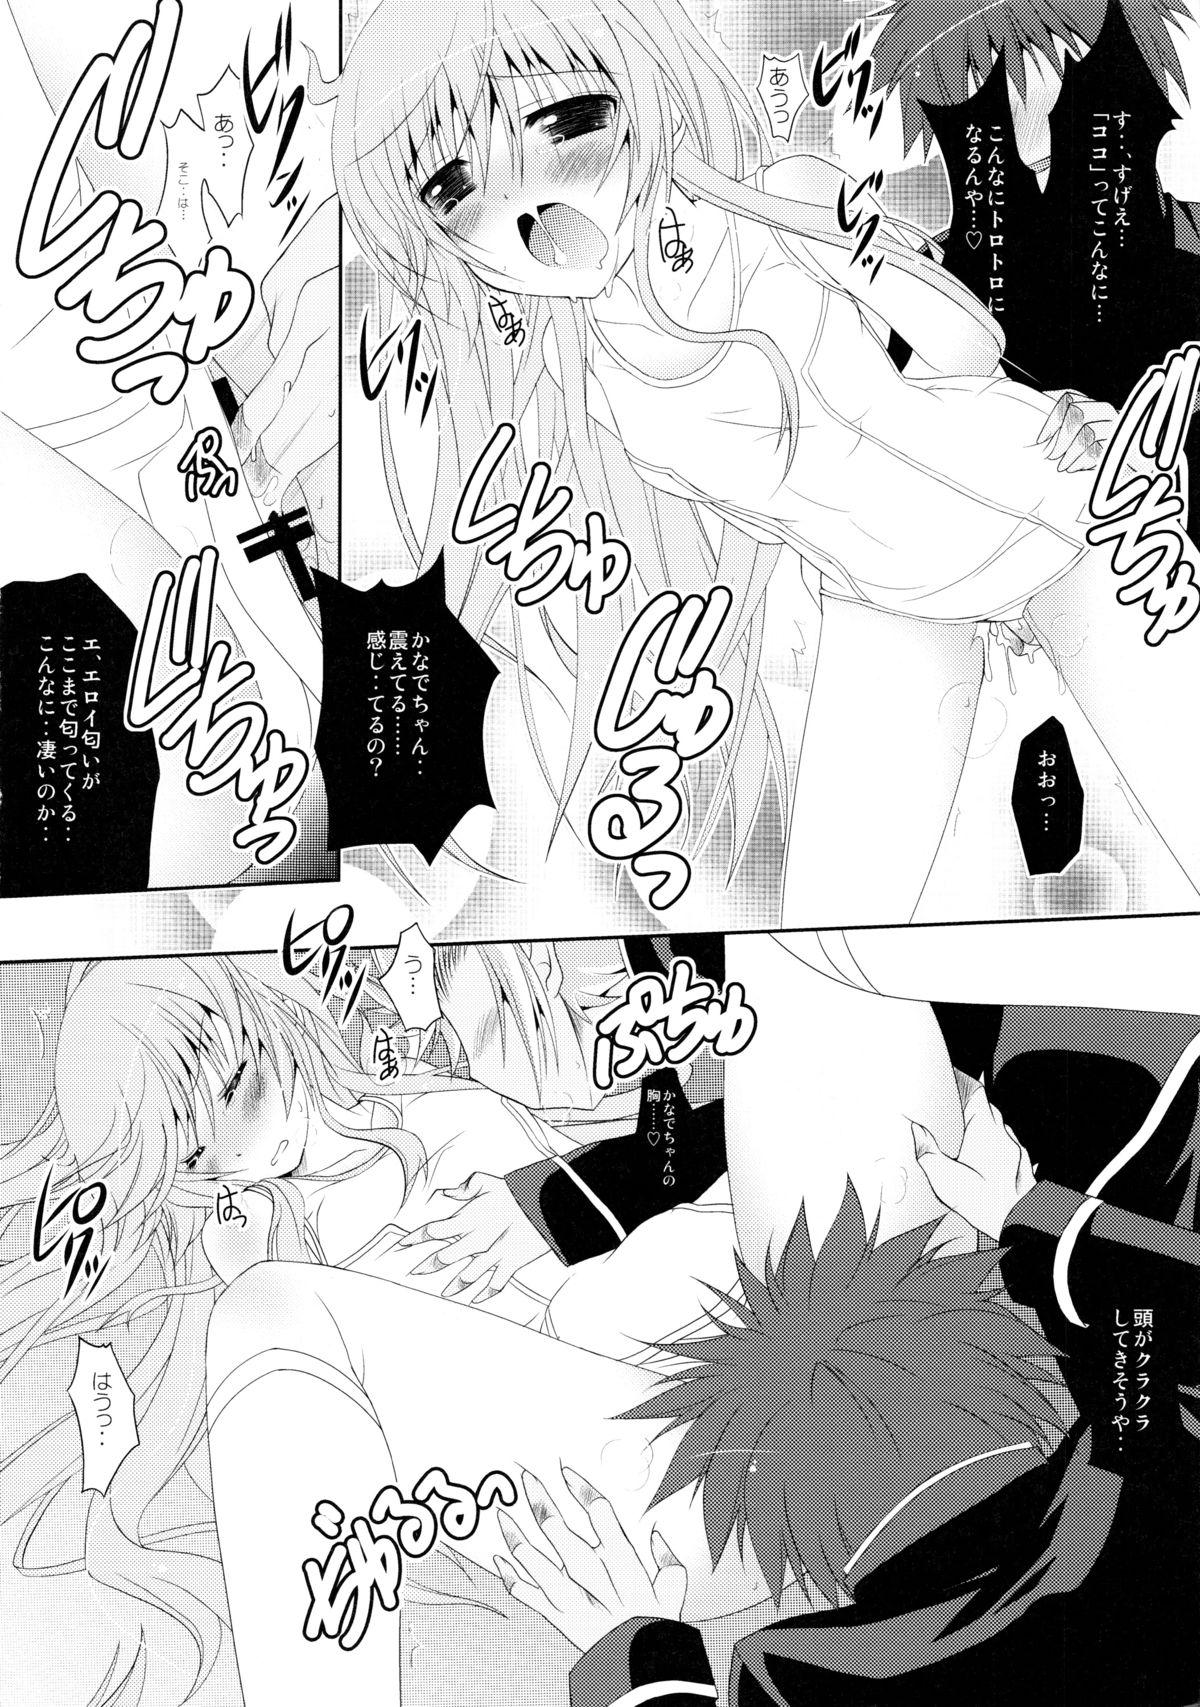 School-mer! School Mizugi Bloomer Joshi Anthology 10